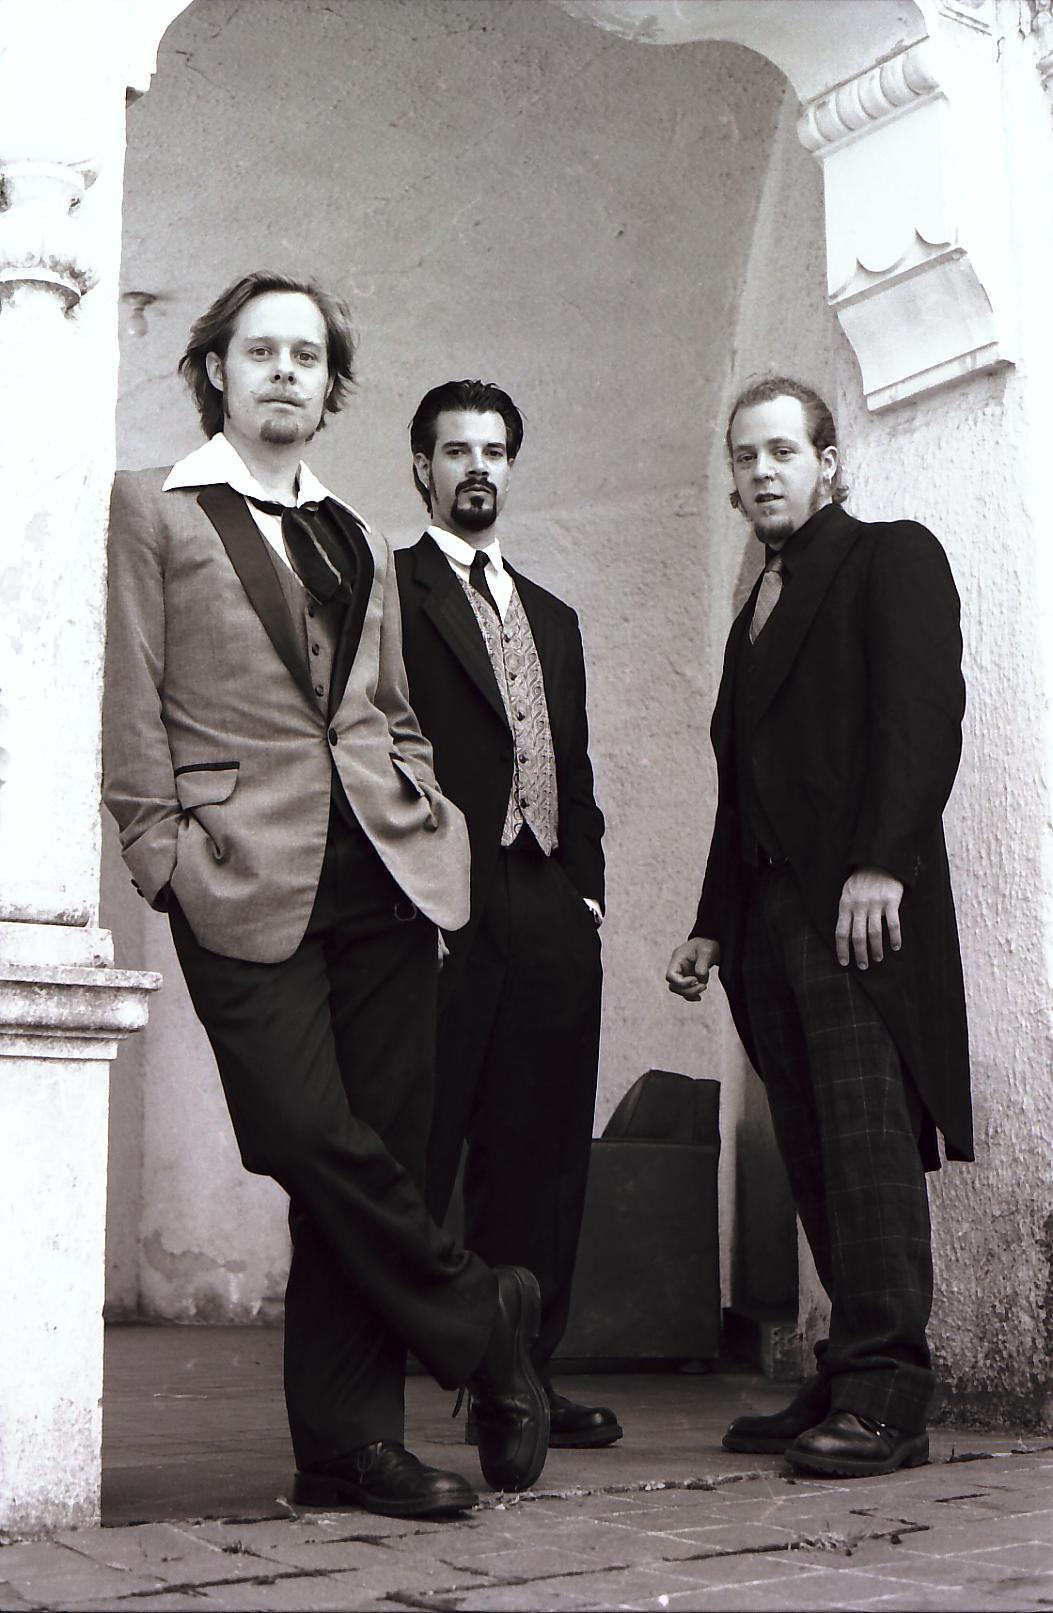 Asheville/Atlanta band The Goodies